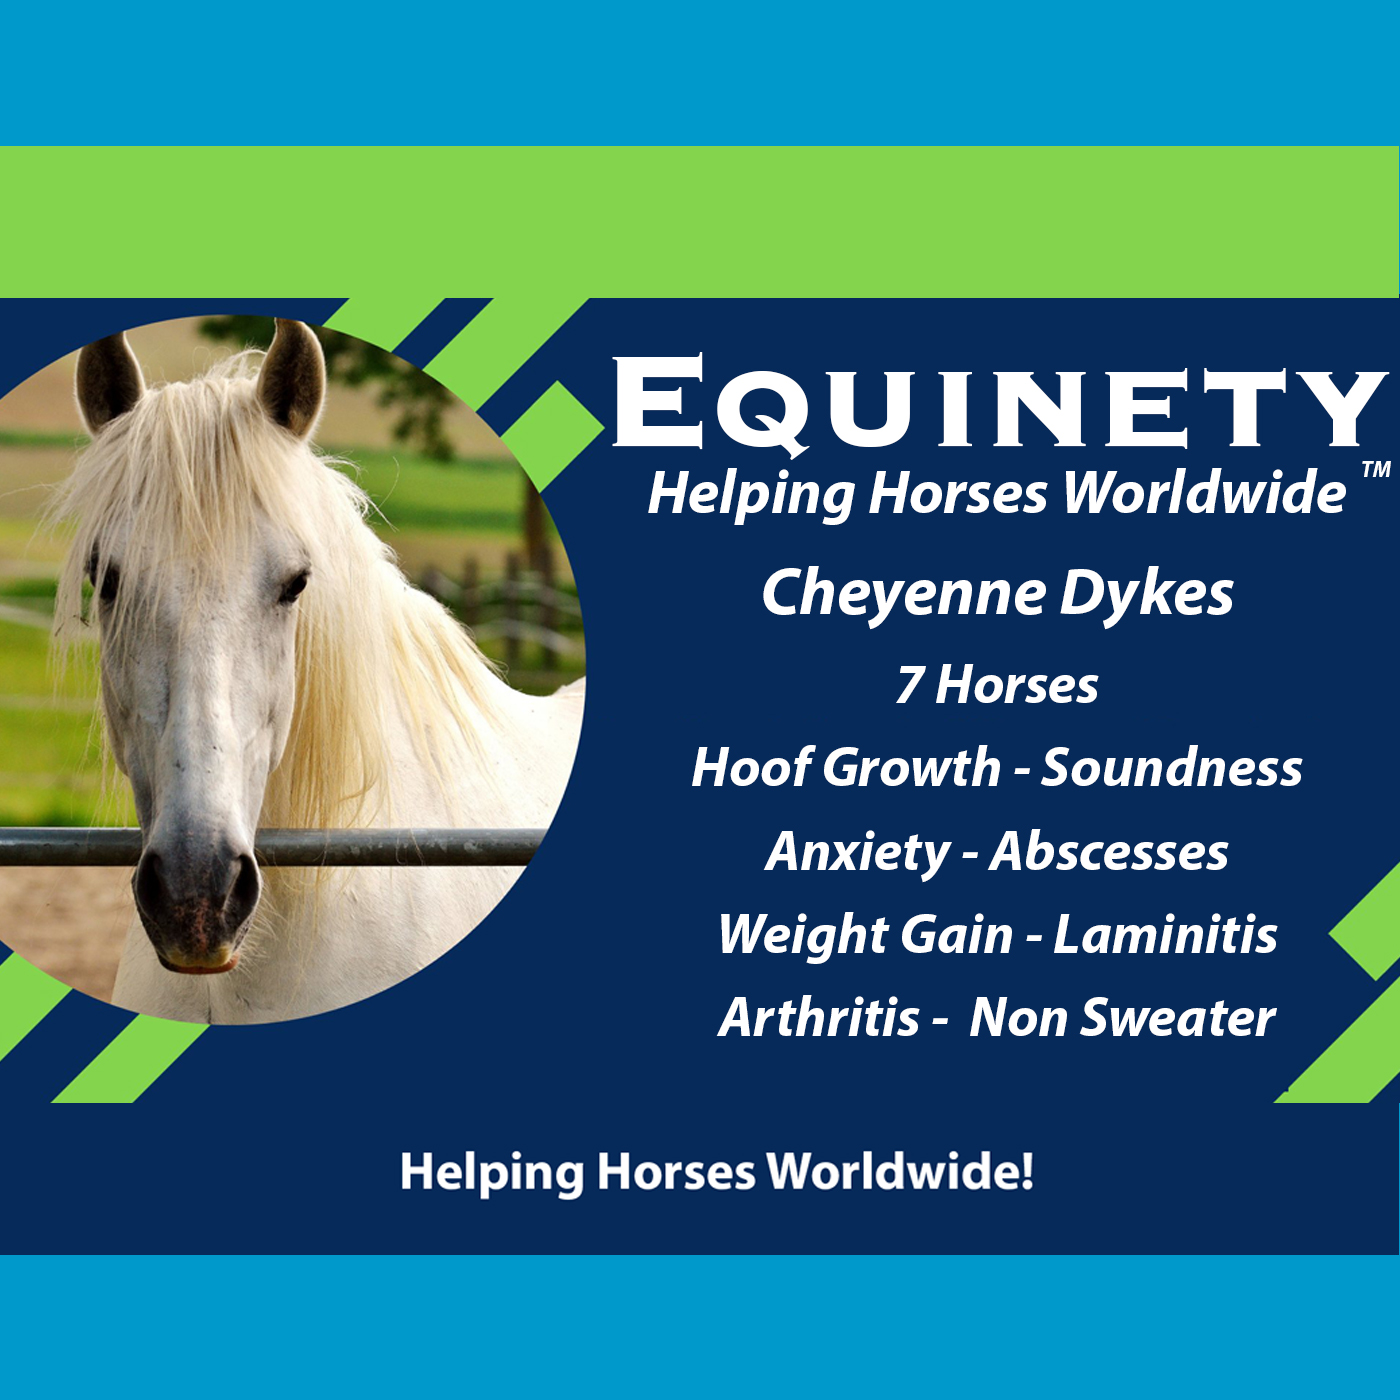 Cheyenne Dykes  – 7 horses – hoof growth – anxiety – laminitis – arthritis - abscesses – non sweater – weight gain - soundness